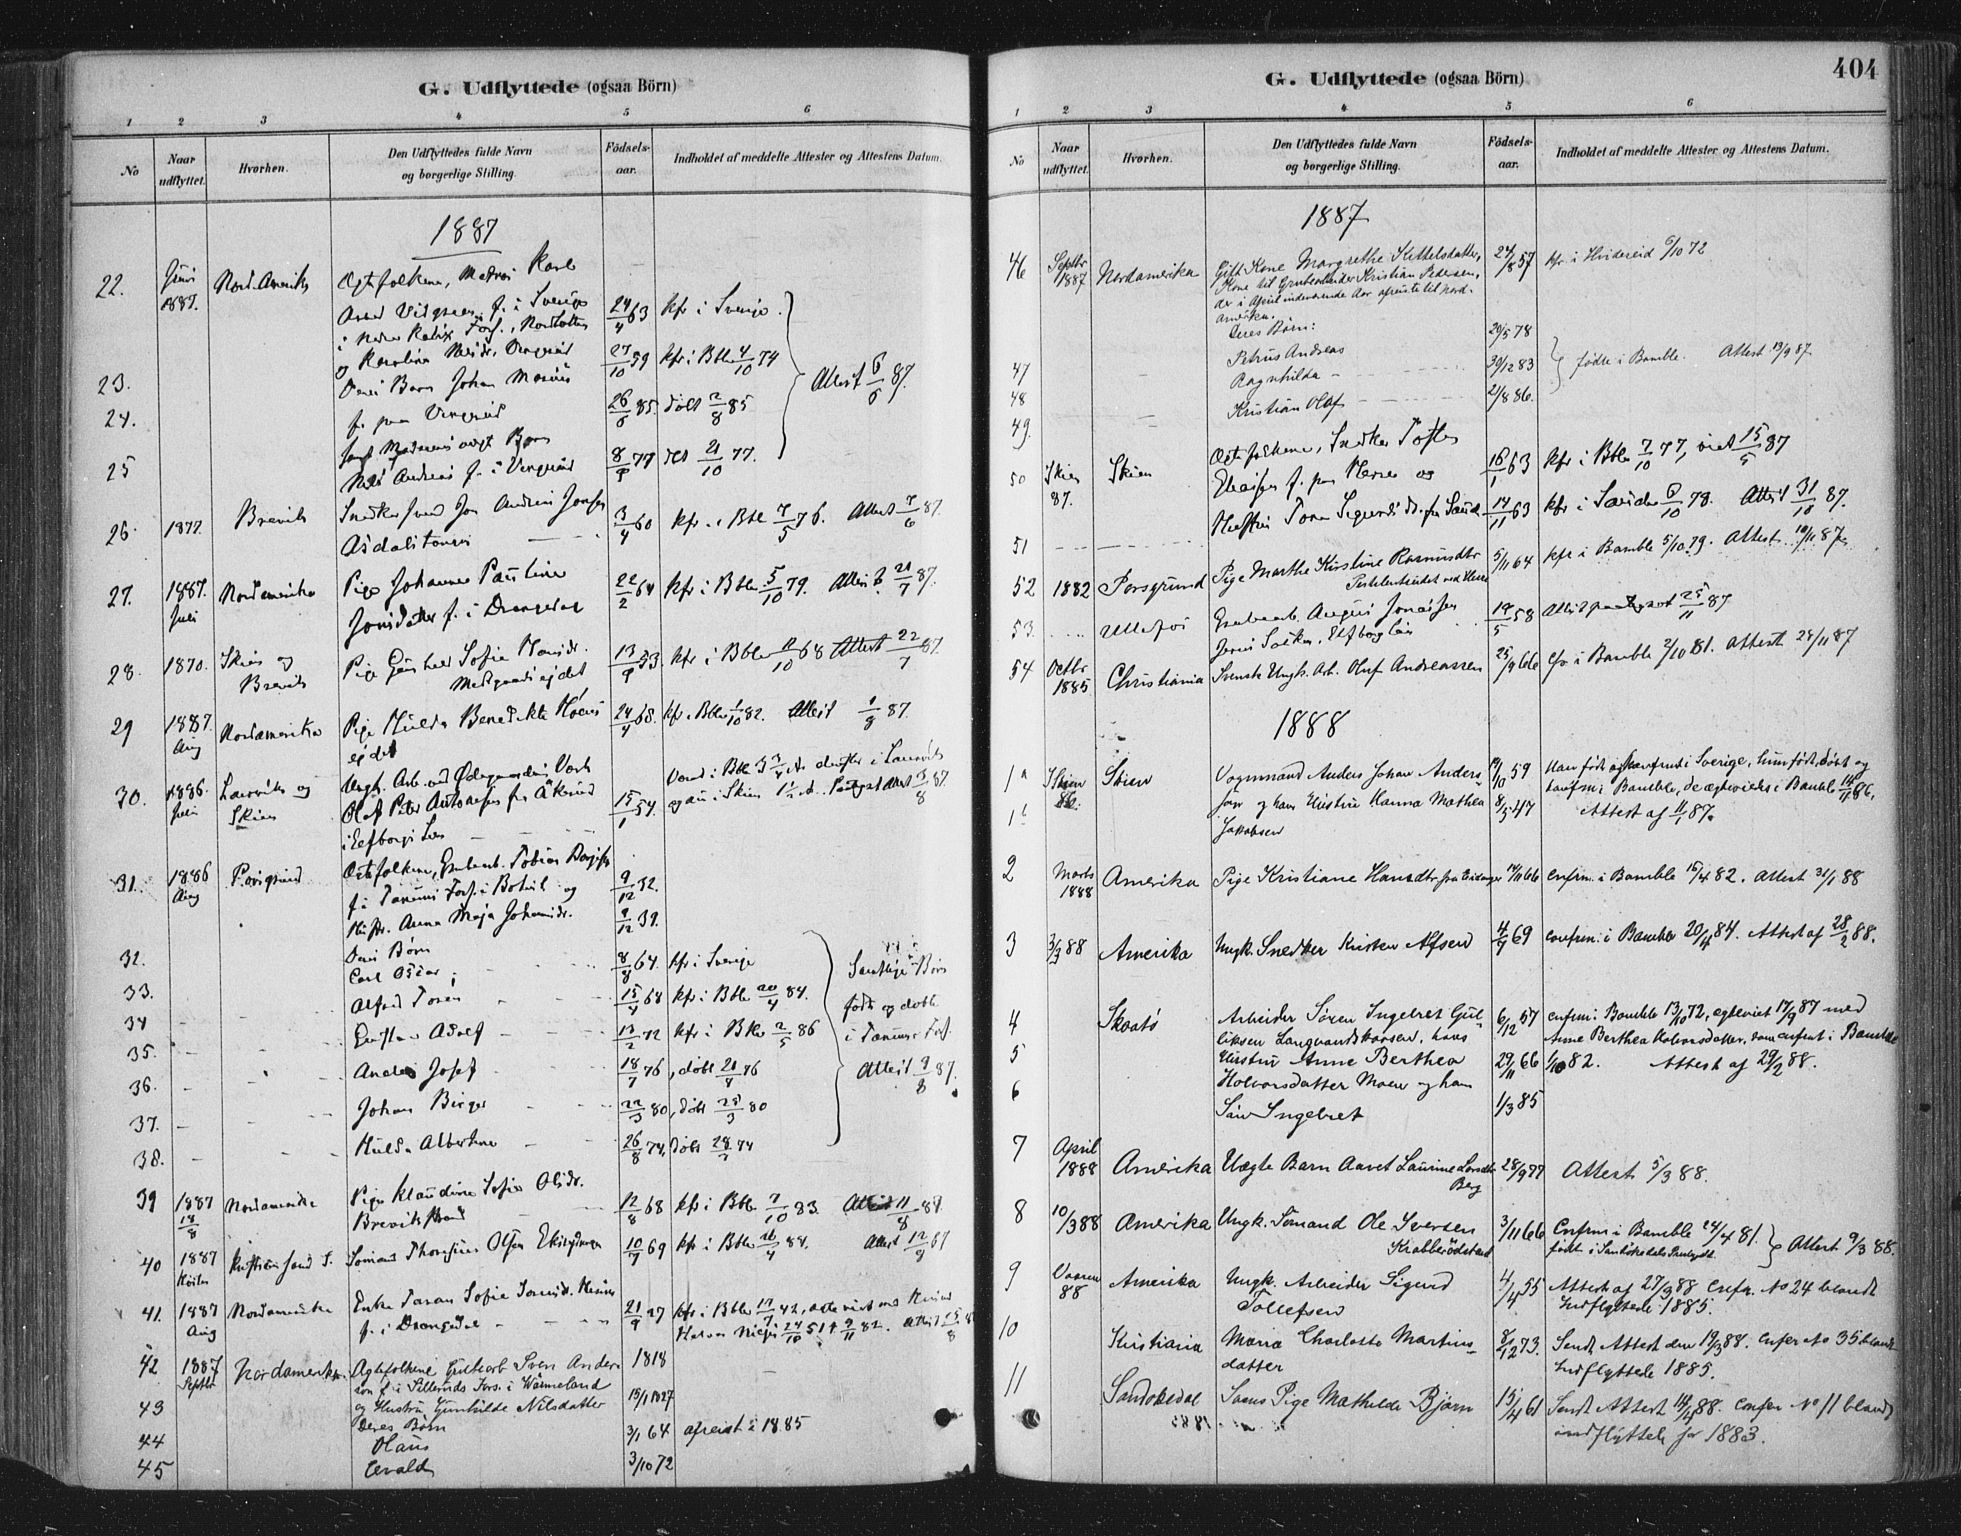 SAKO, Bamble kirkebøker, F/Fa/L0007: Ministerialbok nr. I 7, 1878-1888, s. 404